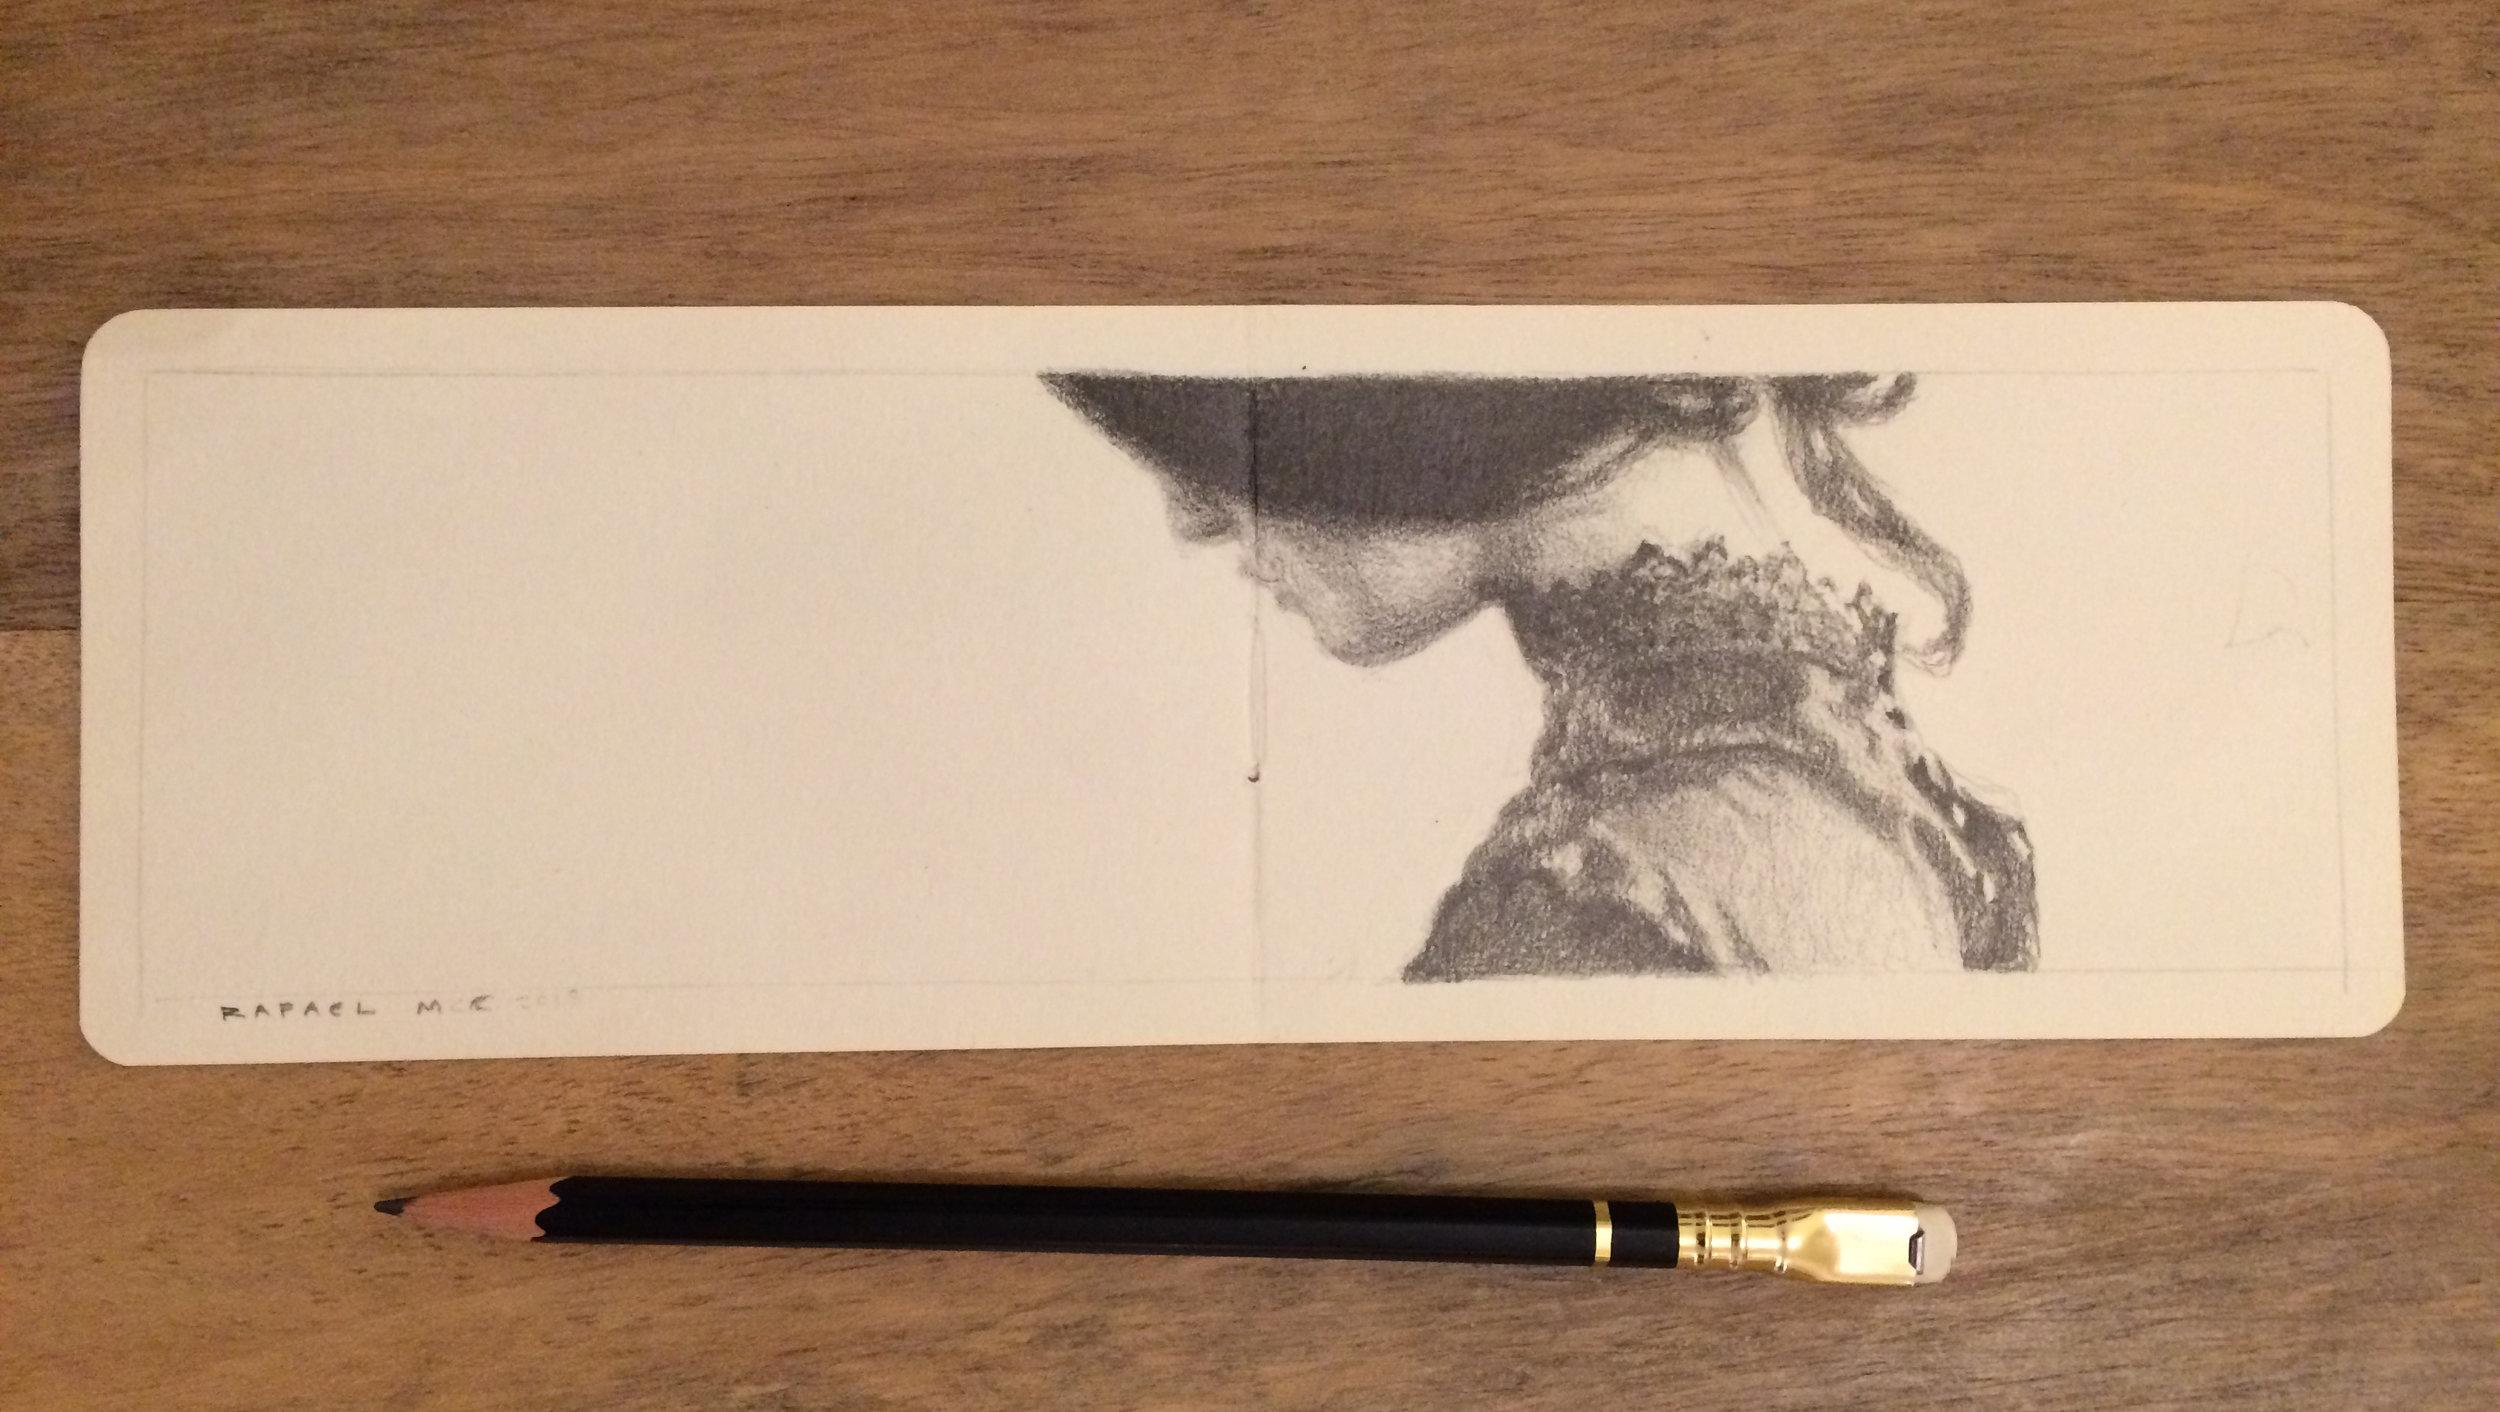 RAFAEL MARTIN C Sketchbook_001.jpg